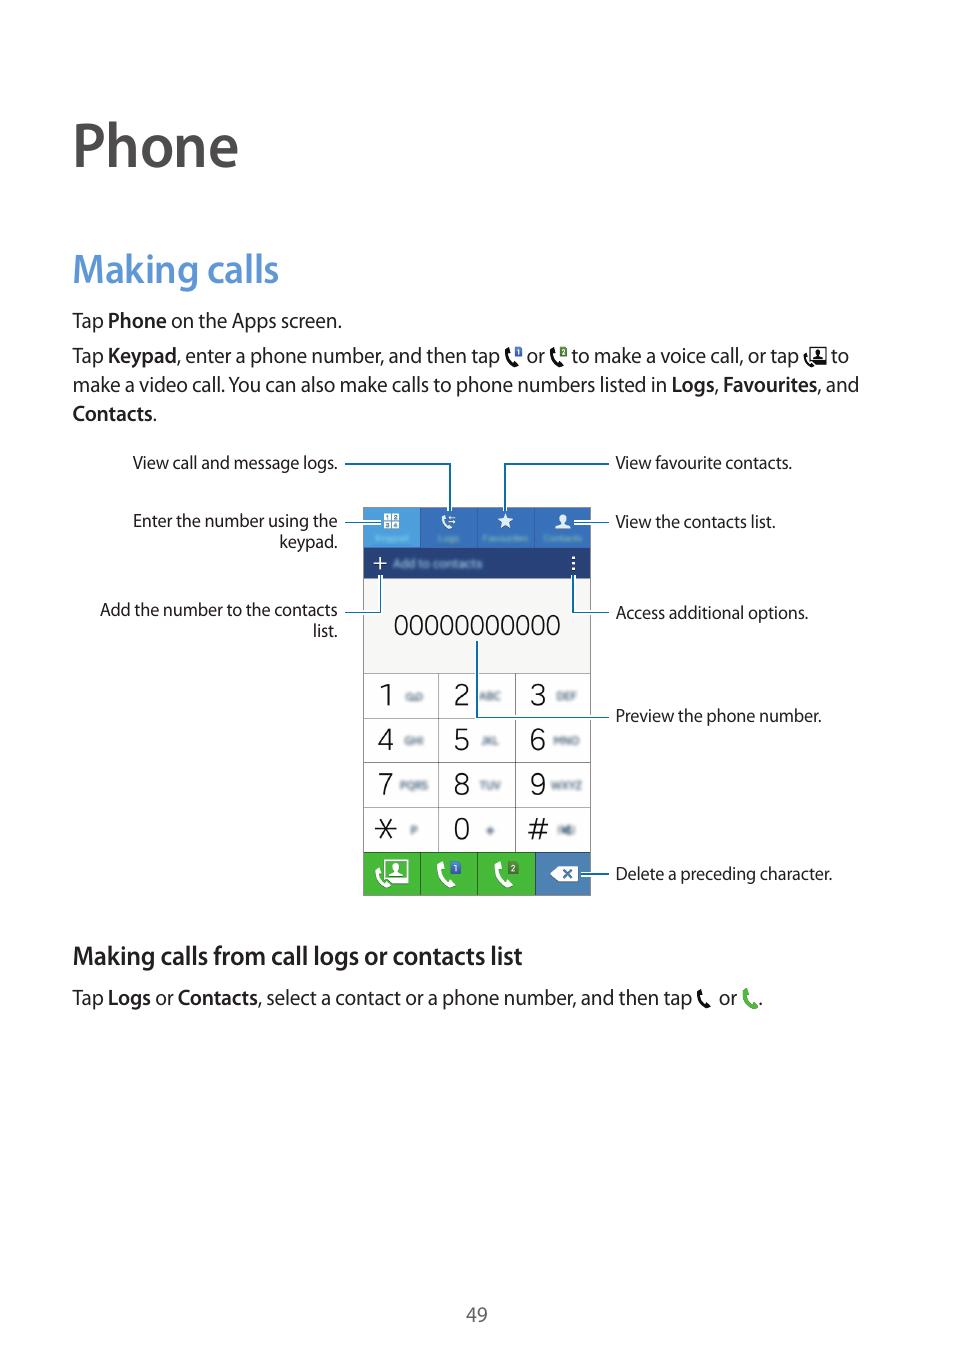 phone making calls 49 making calls samsung galaxy grand prime rh manualsdir com Samsung Cell Phones Samsung Cellular Phones